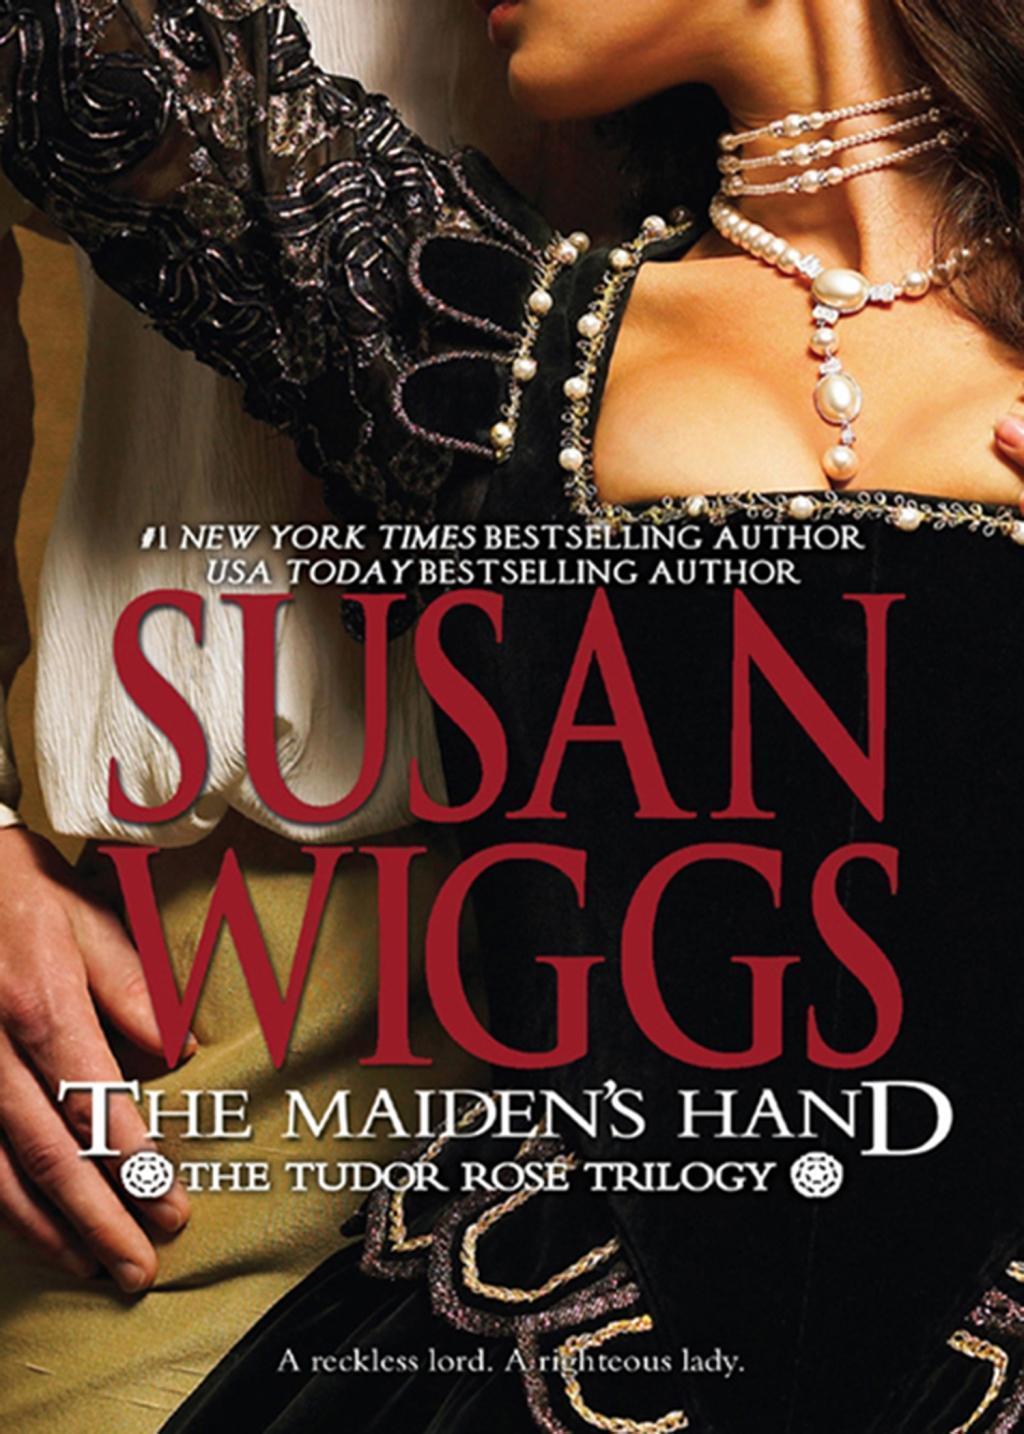 The Maiden's Hand (Mills & Boon M&B)